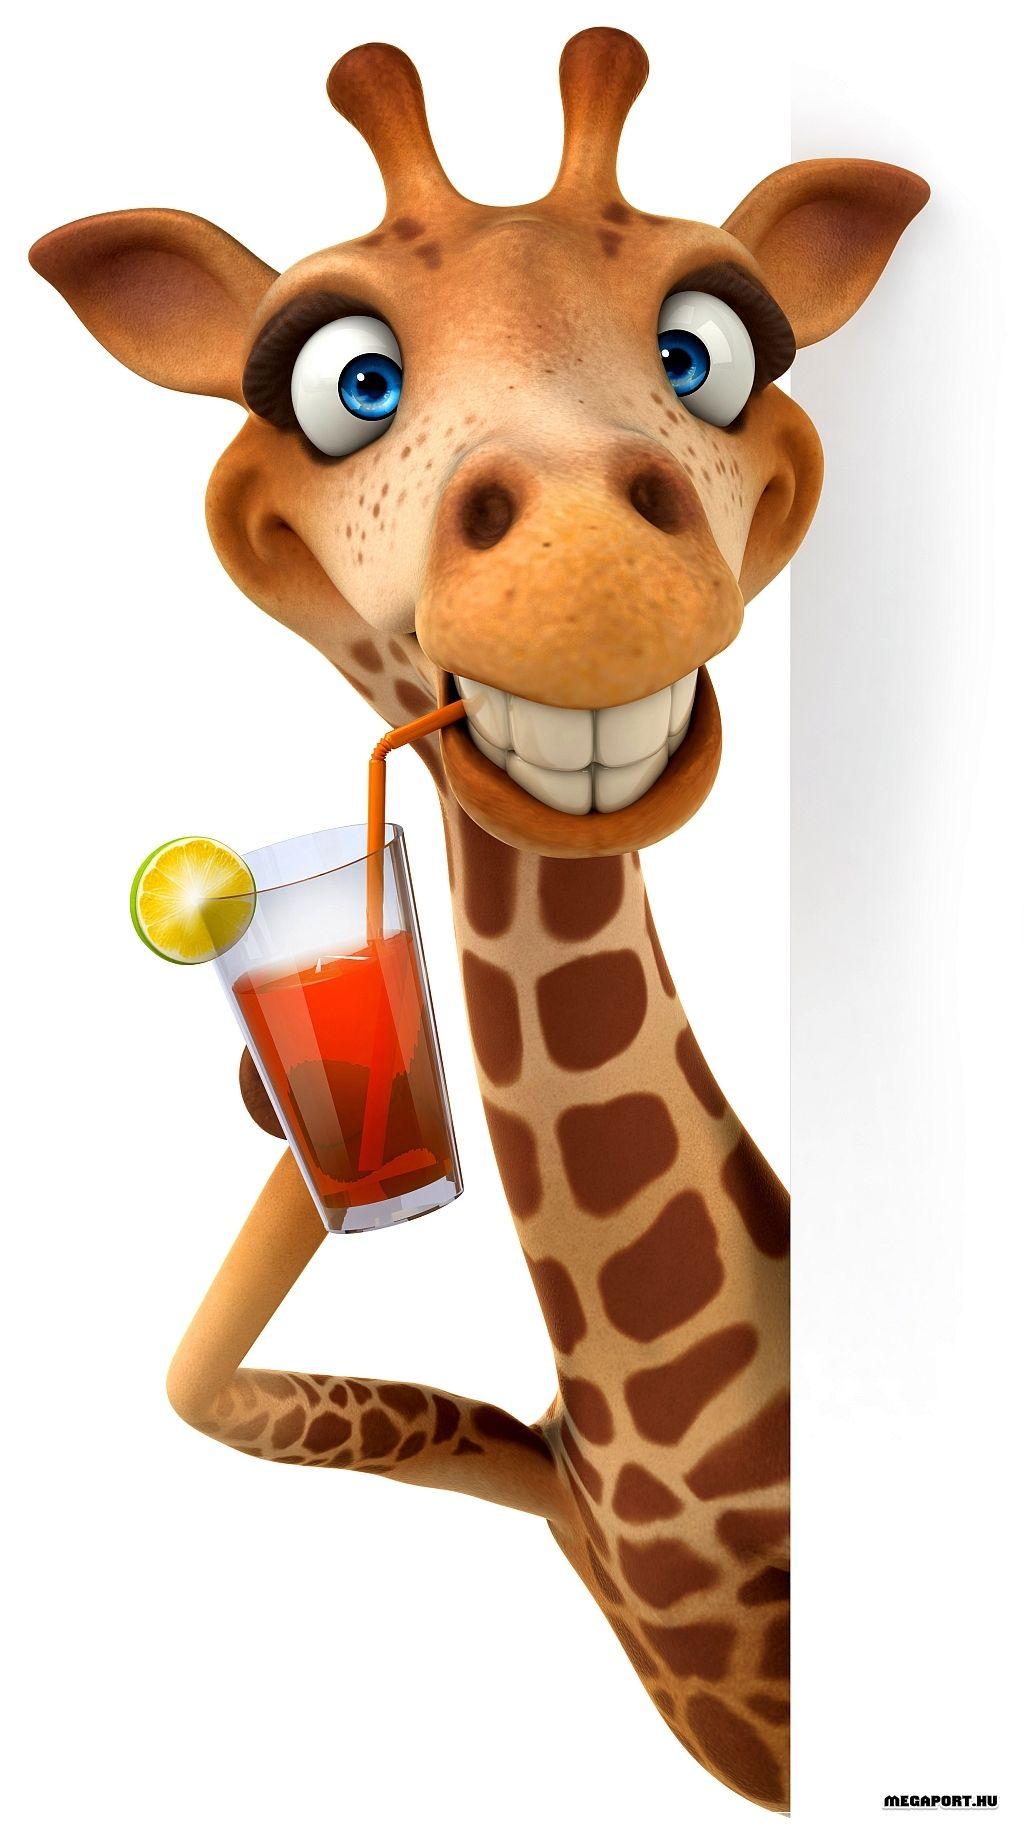 Heyme Again Cute And Funny Giraffe Giraffen Lustige